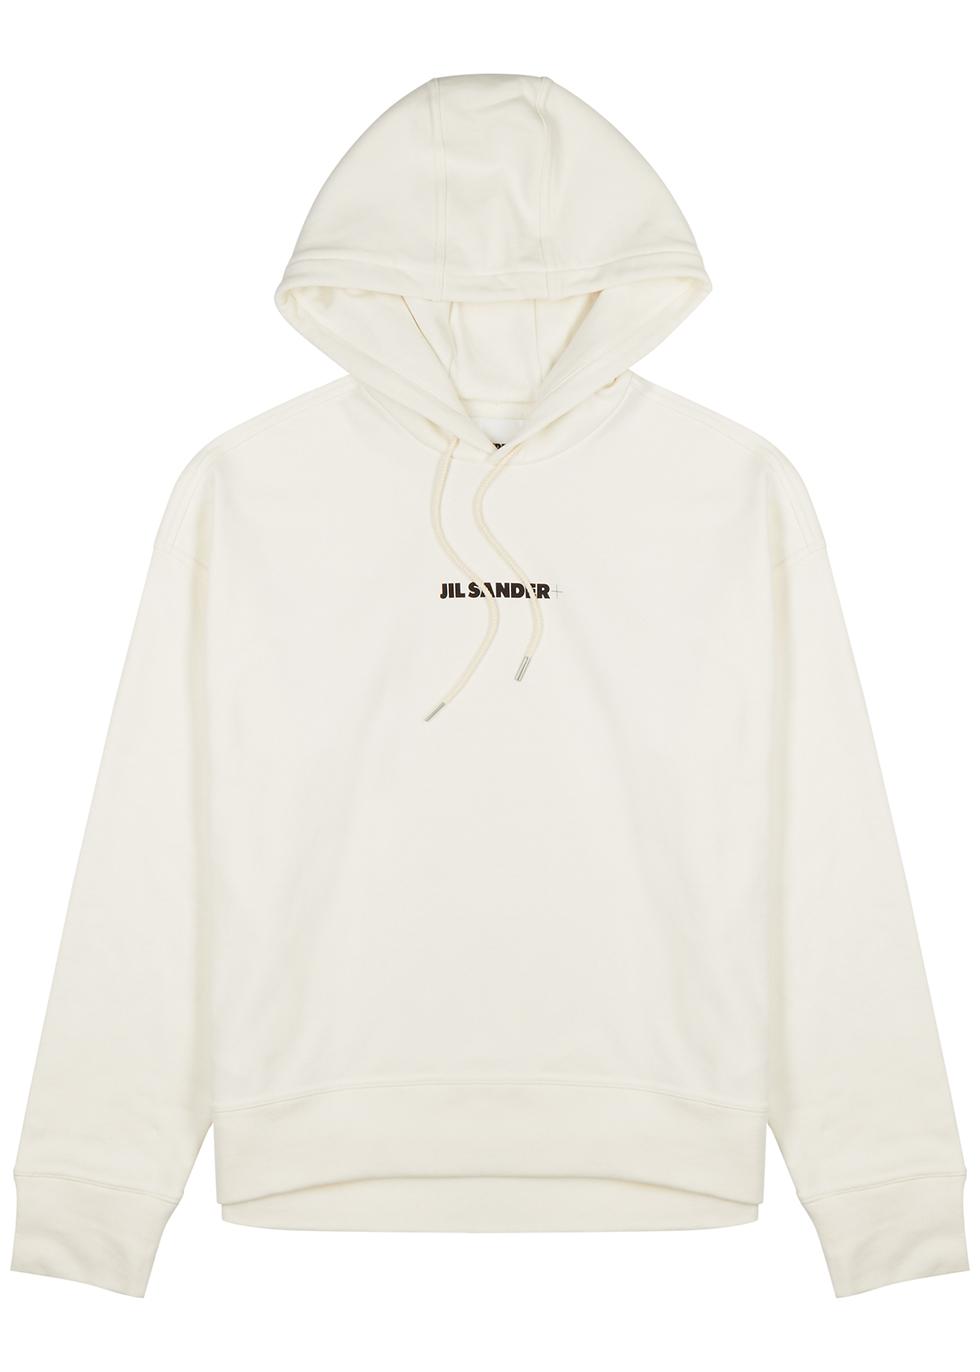 Off-white logo hooded cotton sweatshirt